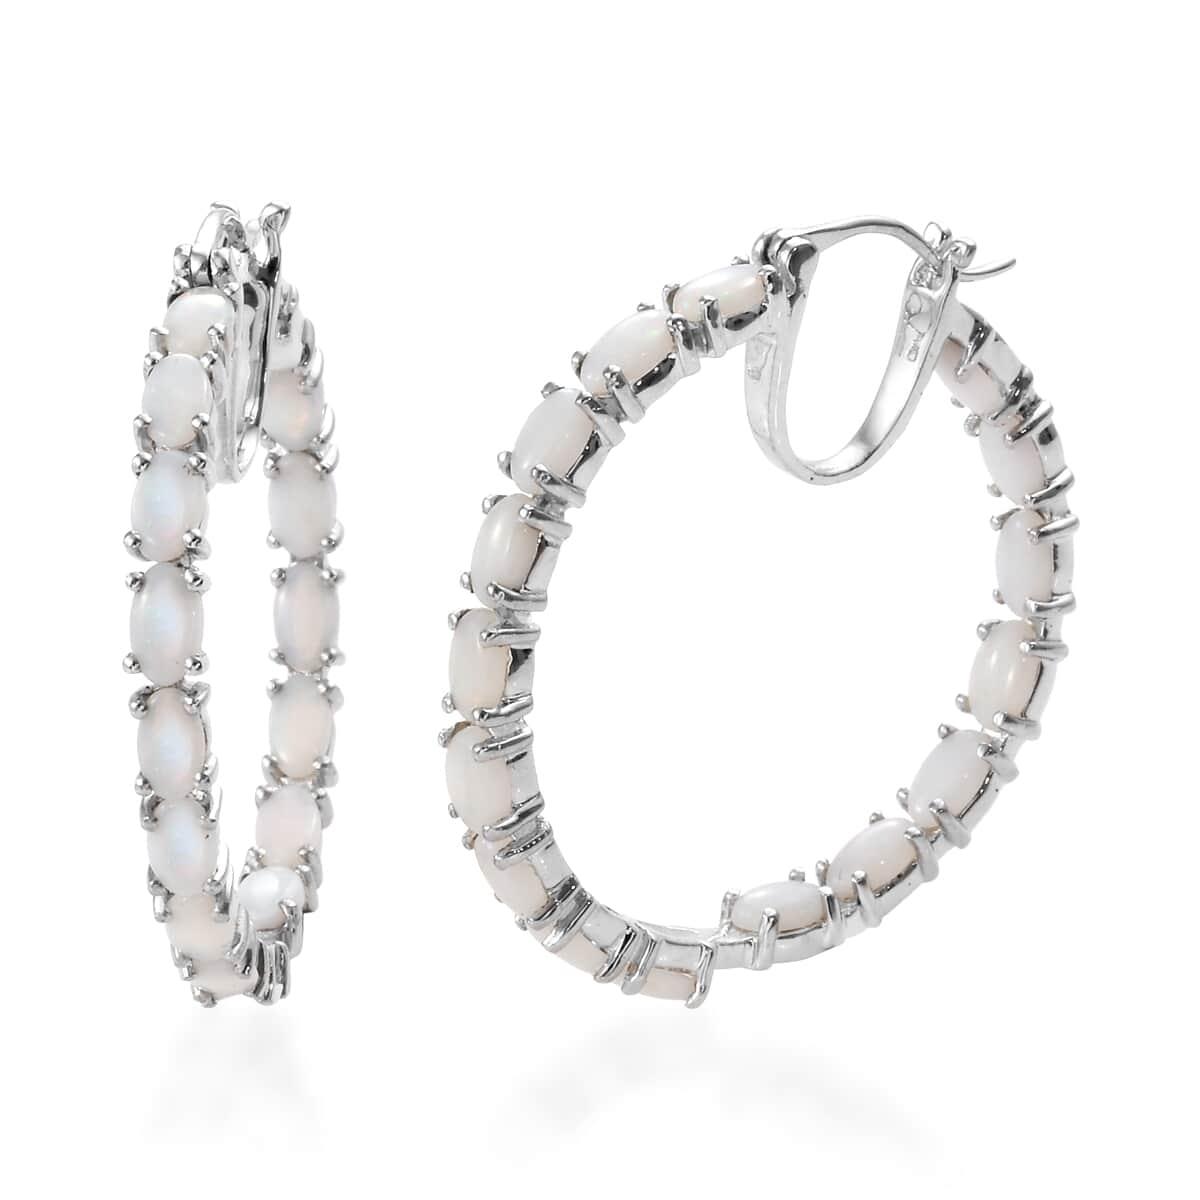 ab9954543faa4 Australian White Opal Inside Out Hoop Earrings in Platinum Over Sterling  Silver 5.10 ctw